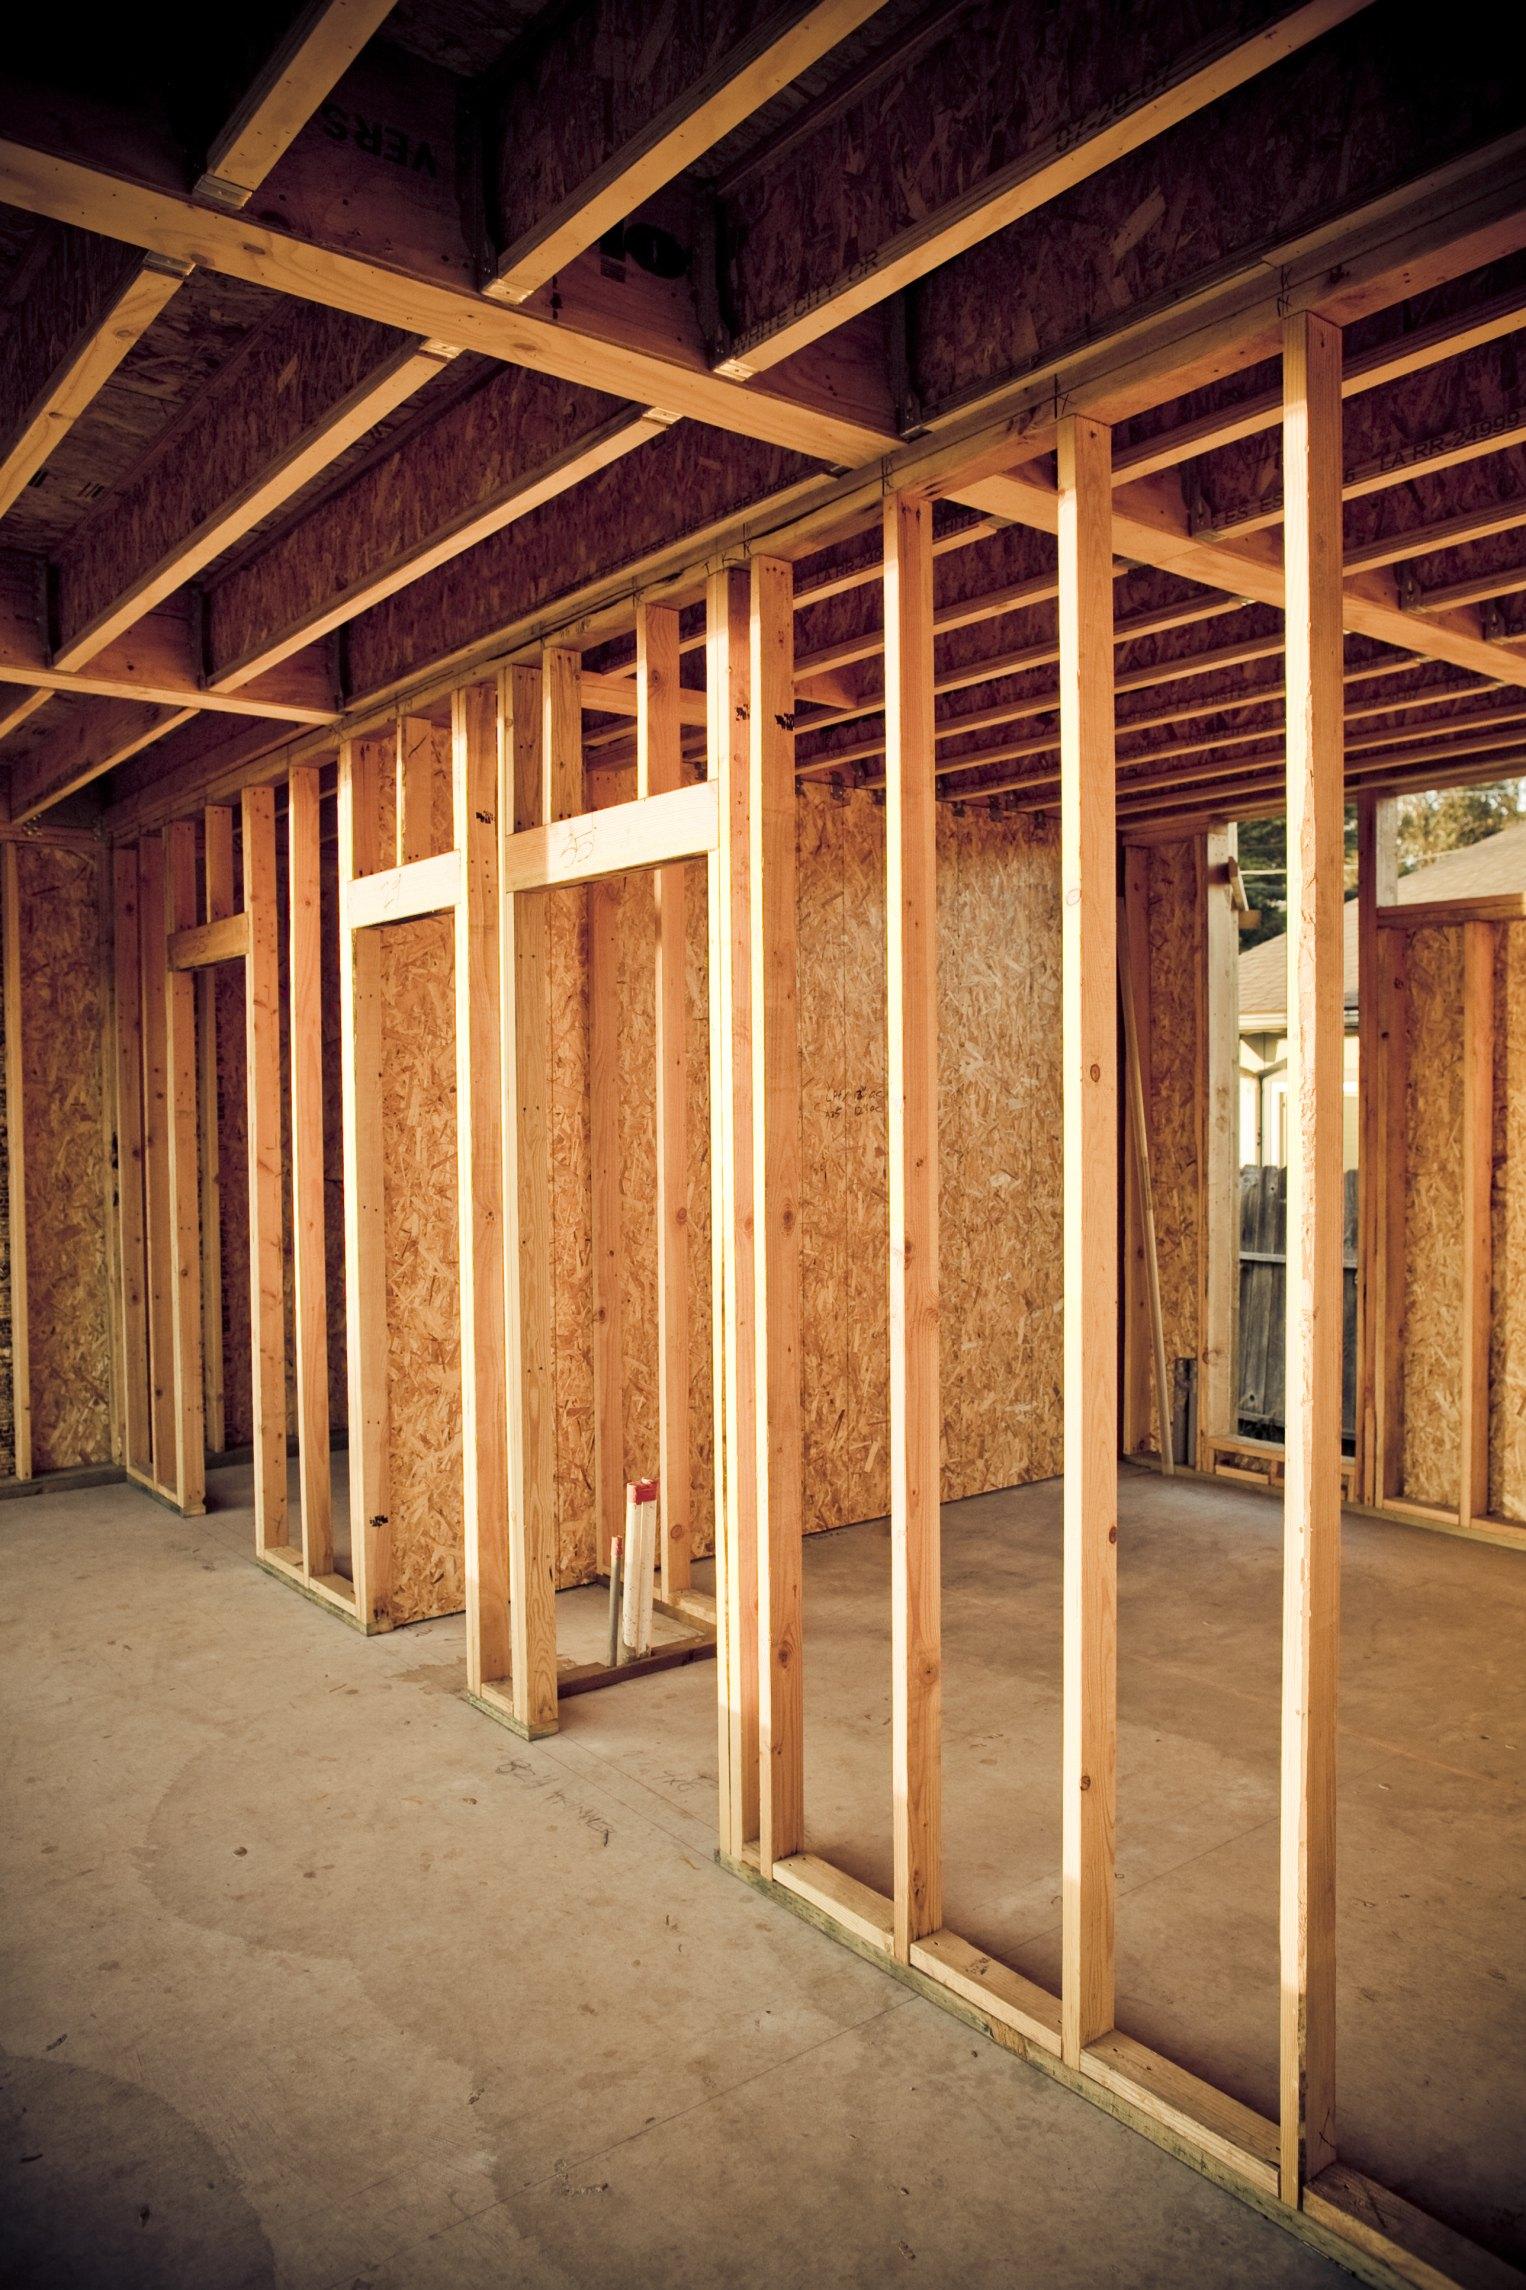 How To Repair Patio Screen Door Rollers: How To Repair Sagging Roof Rafters